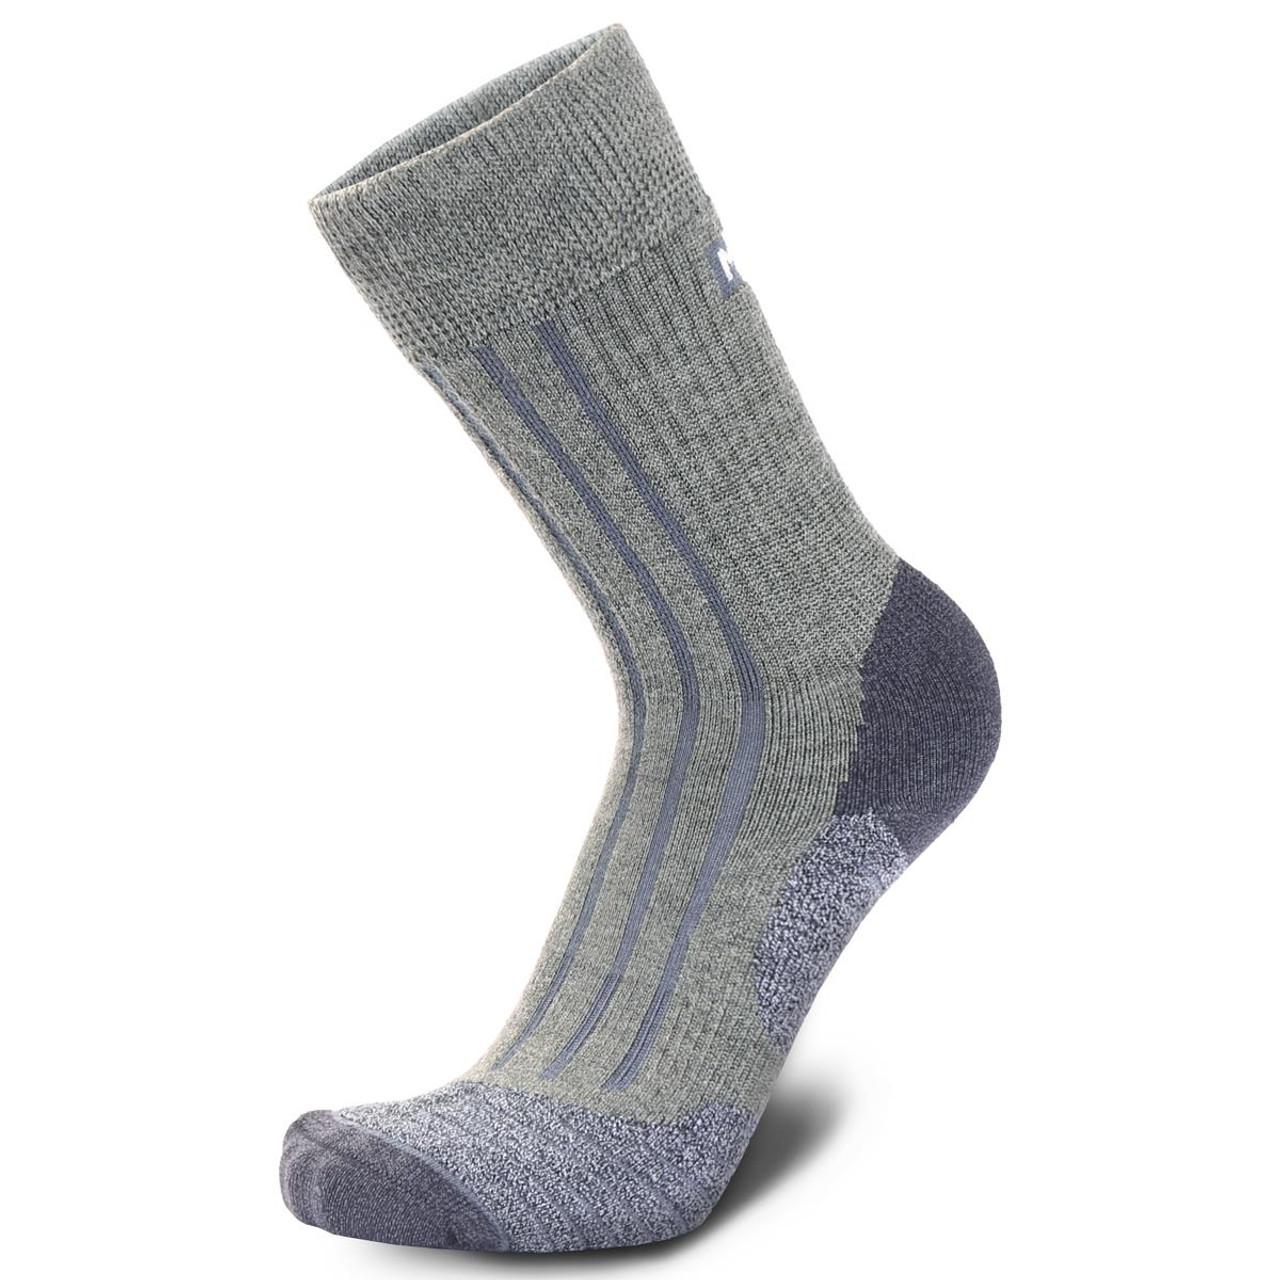 Meindl Mens MT Hunting Socks Short